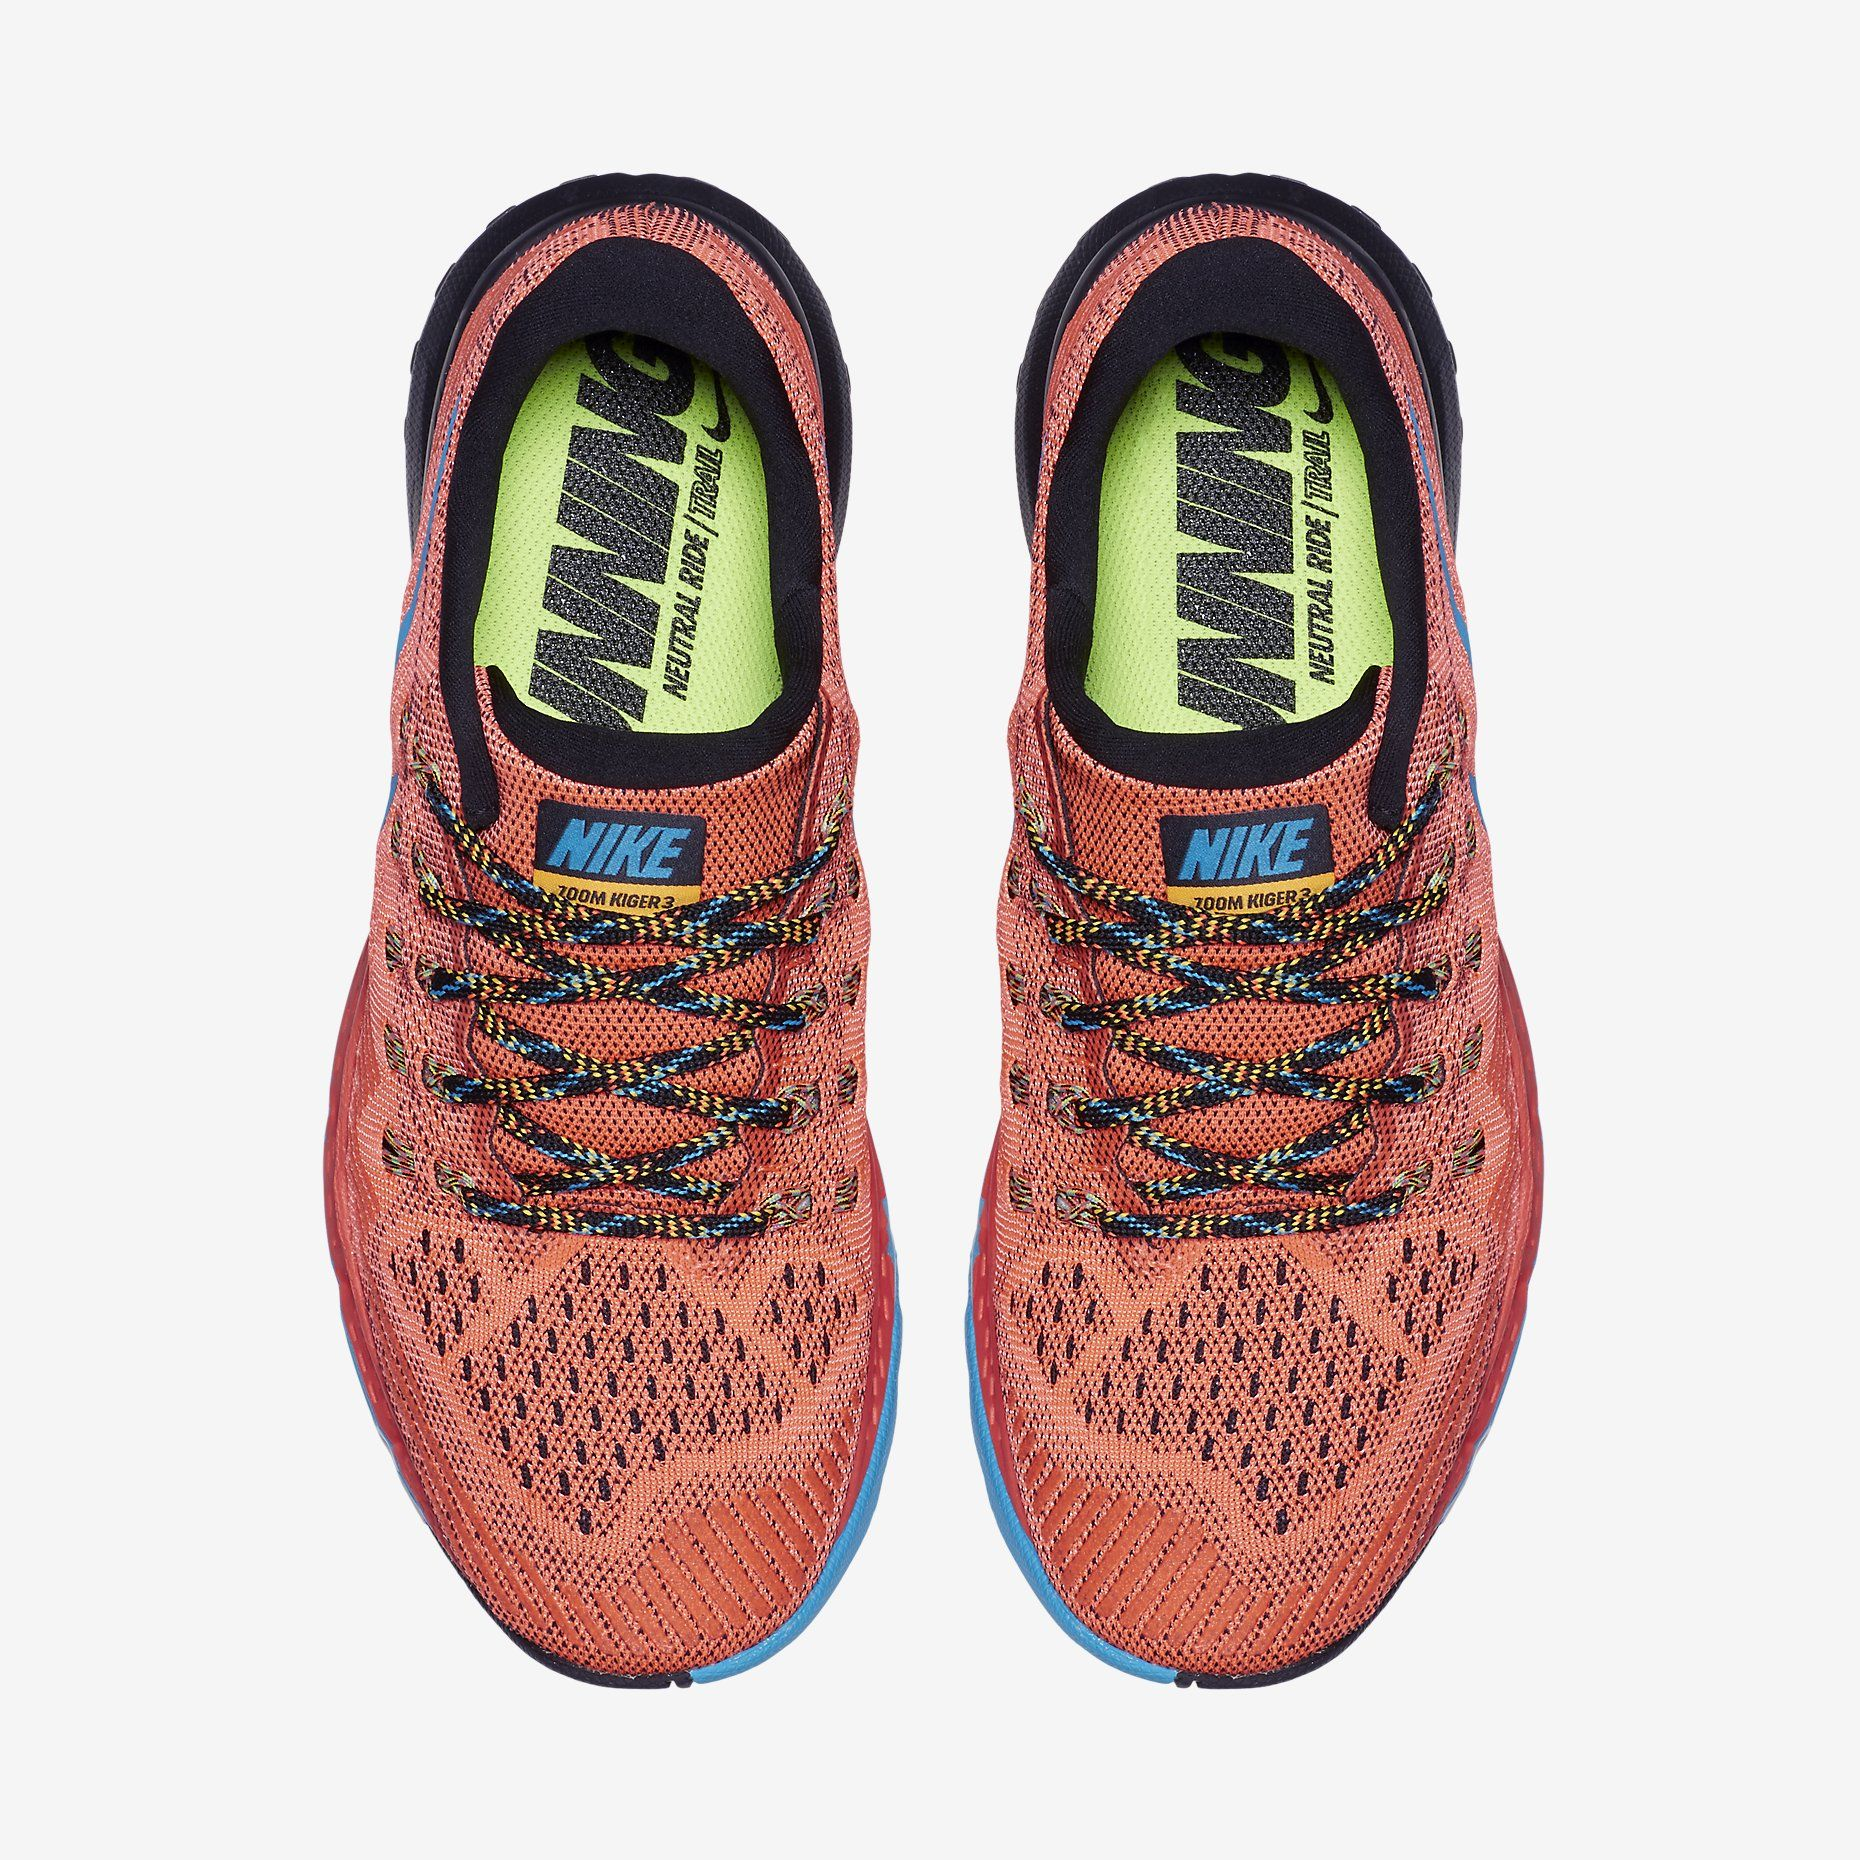 new styles f7832 88890 Nike Air Zoom Terra Kiger 3 Womens Running Shoe. Nike.com